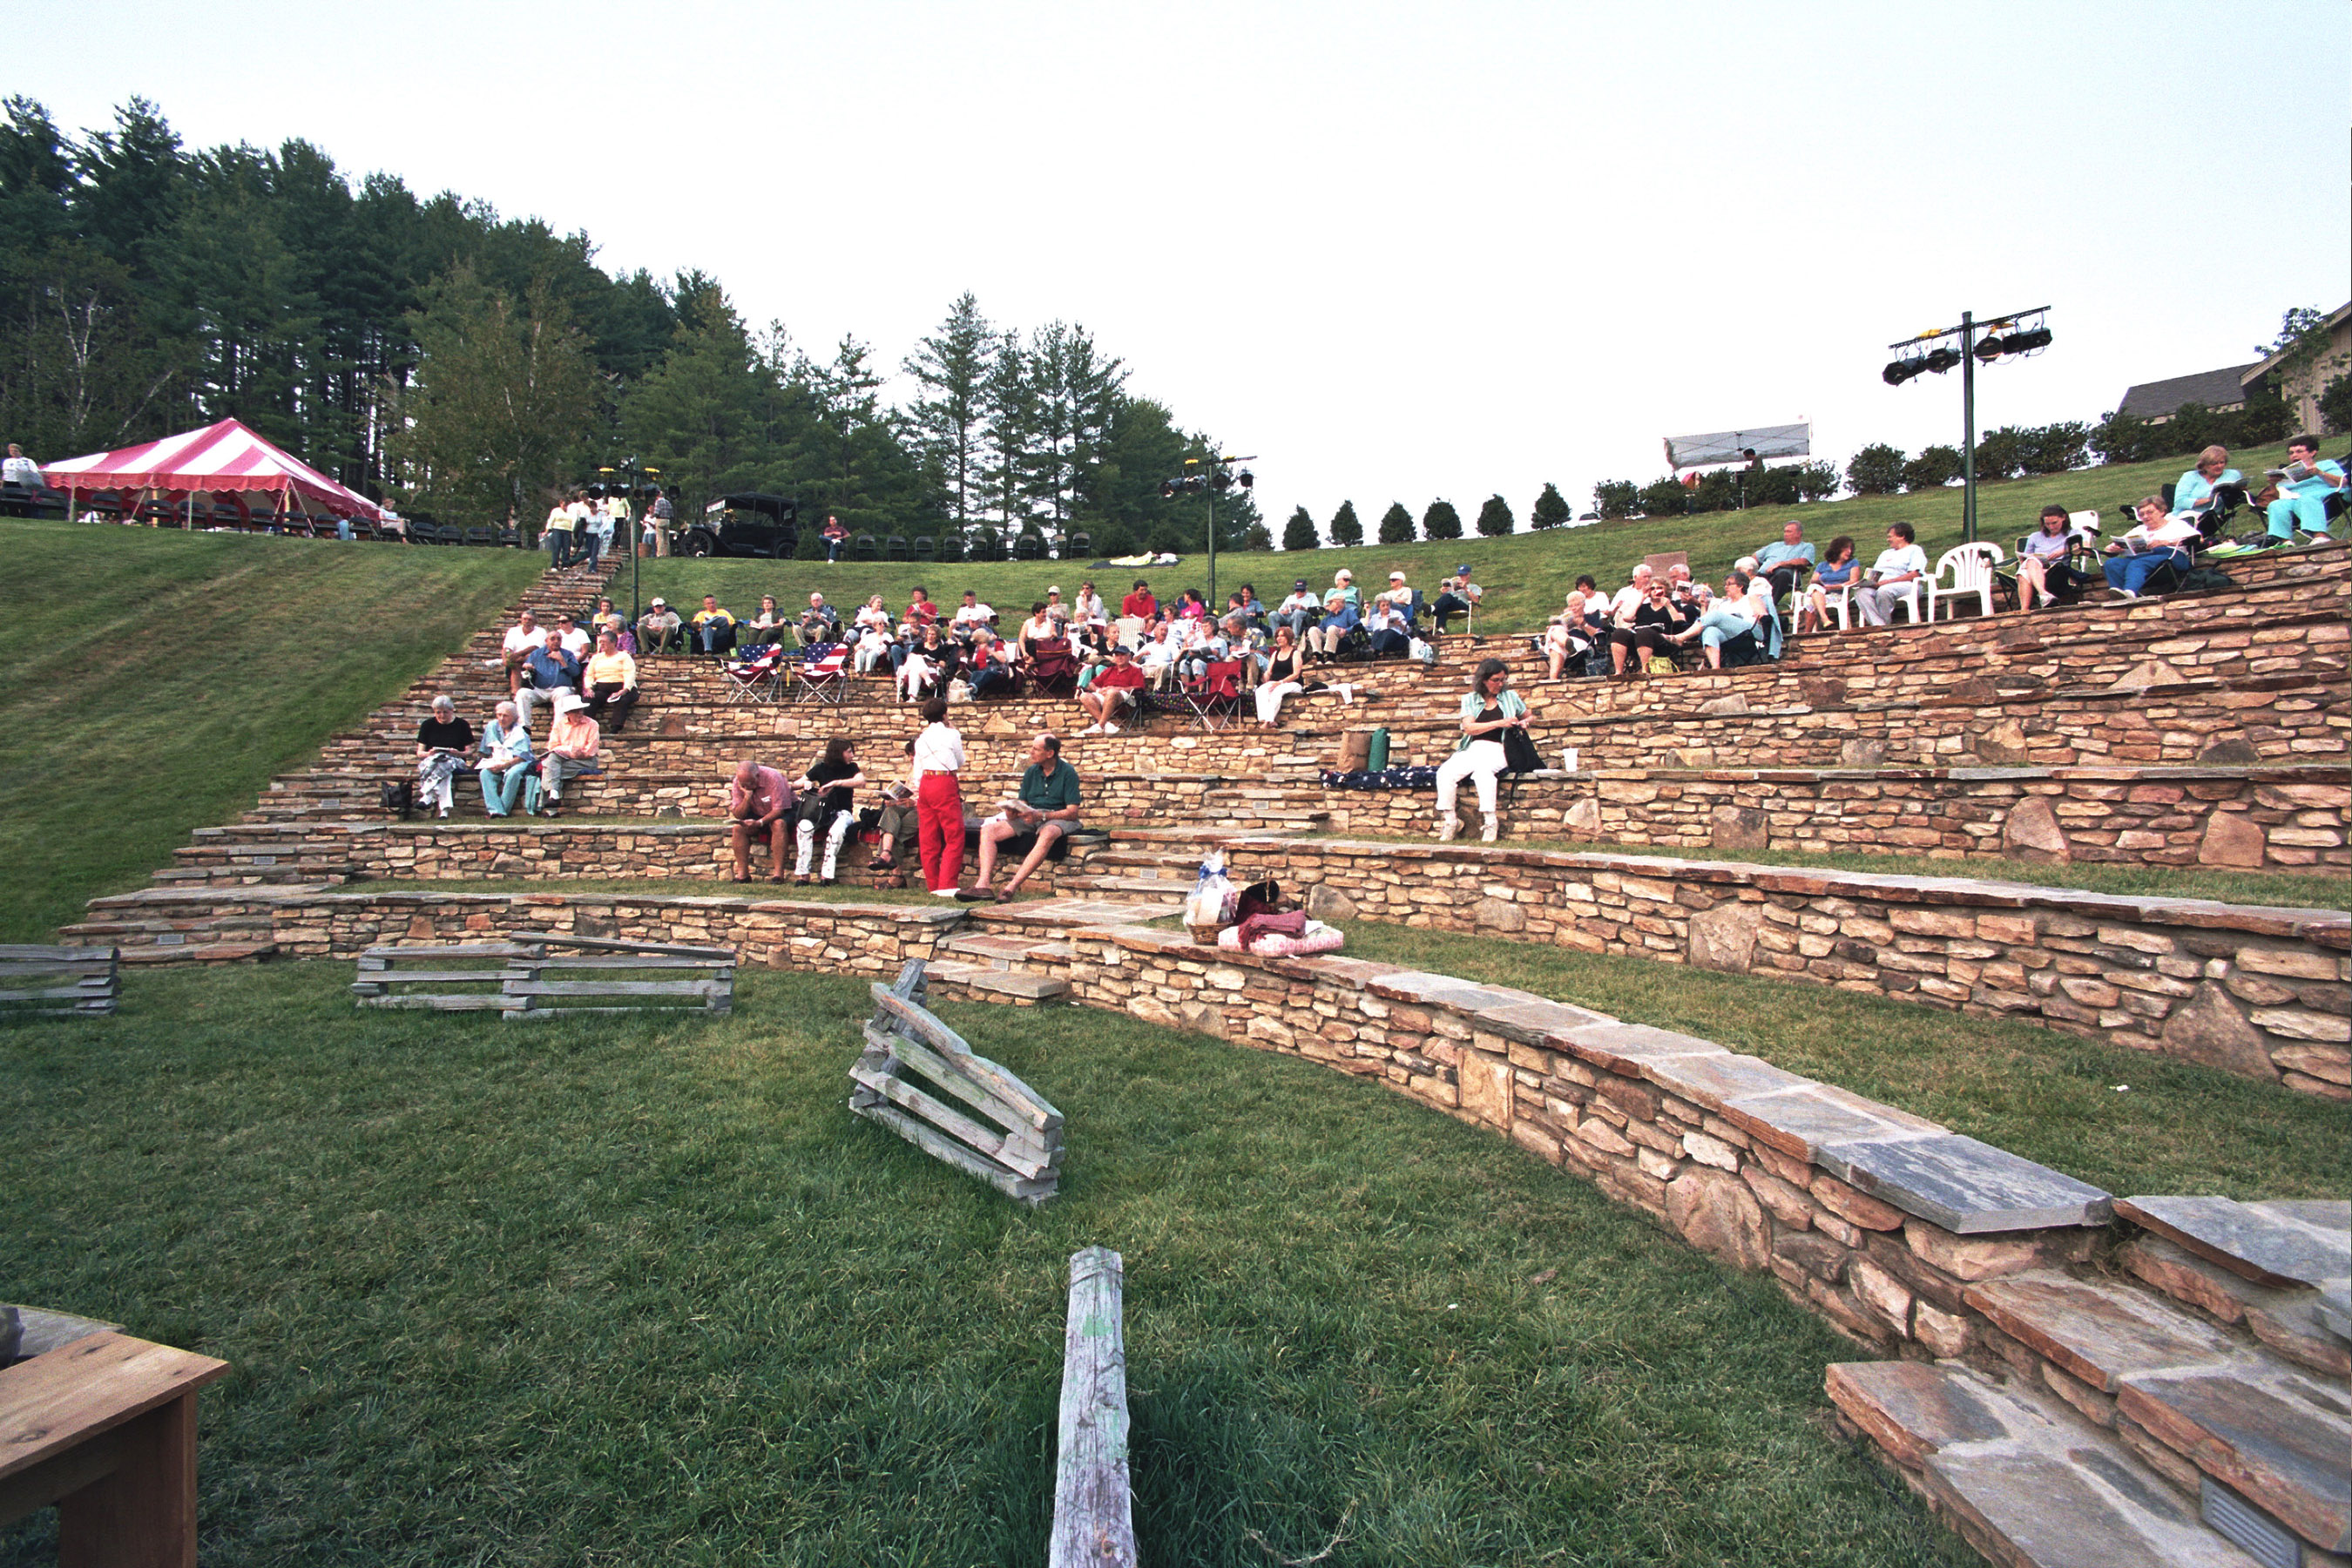 Crossnore School Amphitheater